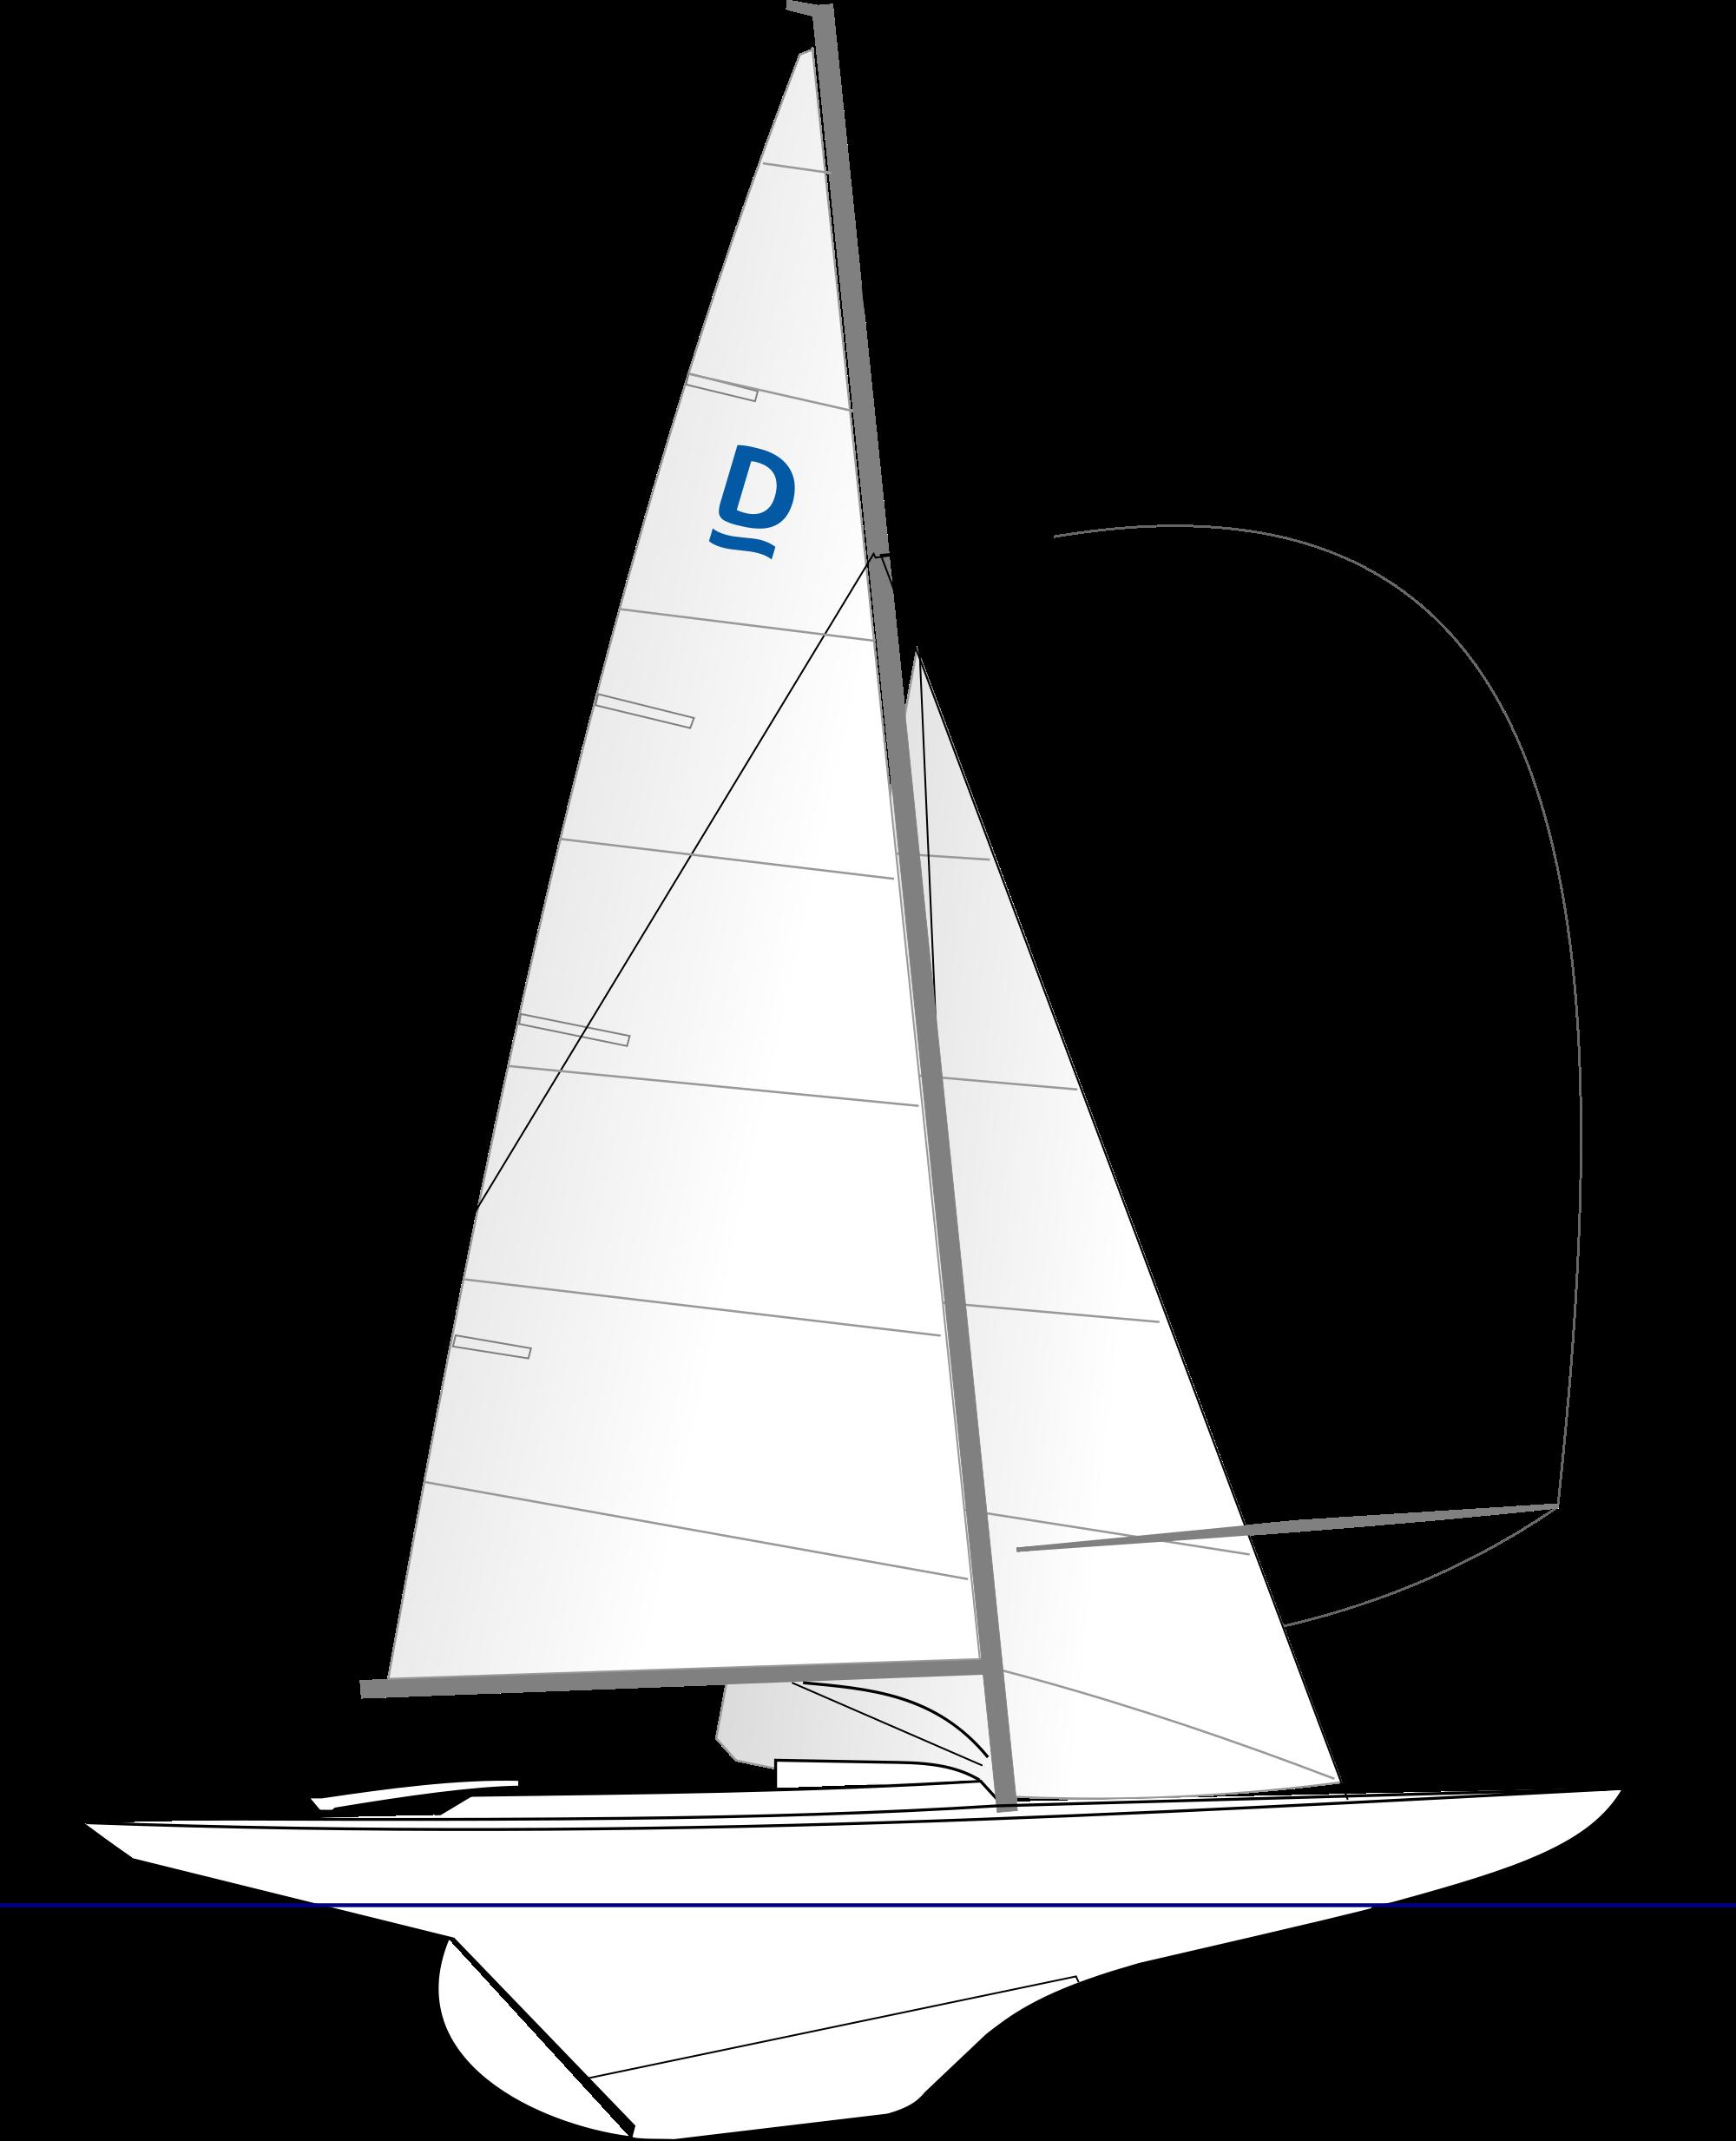 Dragon Keelboat